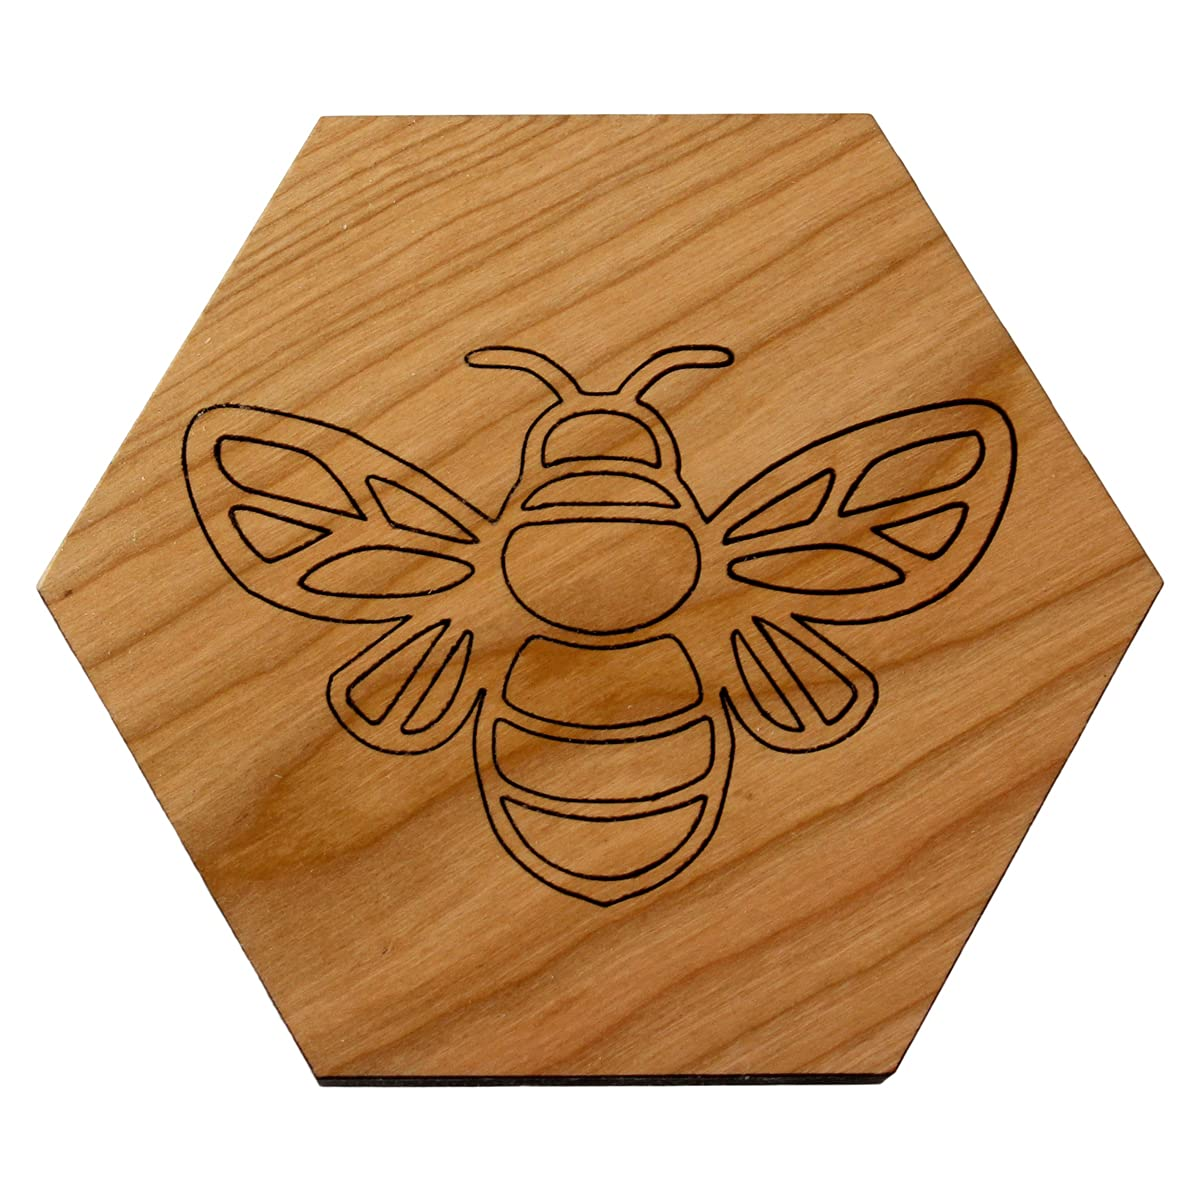 Honey Bee Hexagon Low OFFicial store price Trivet- Solid Cherry Wood Holde Trivet Hot Pad